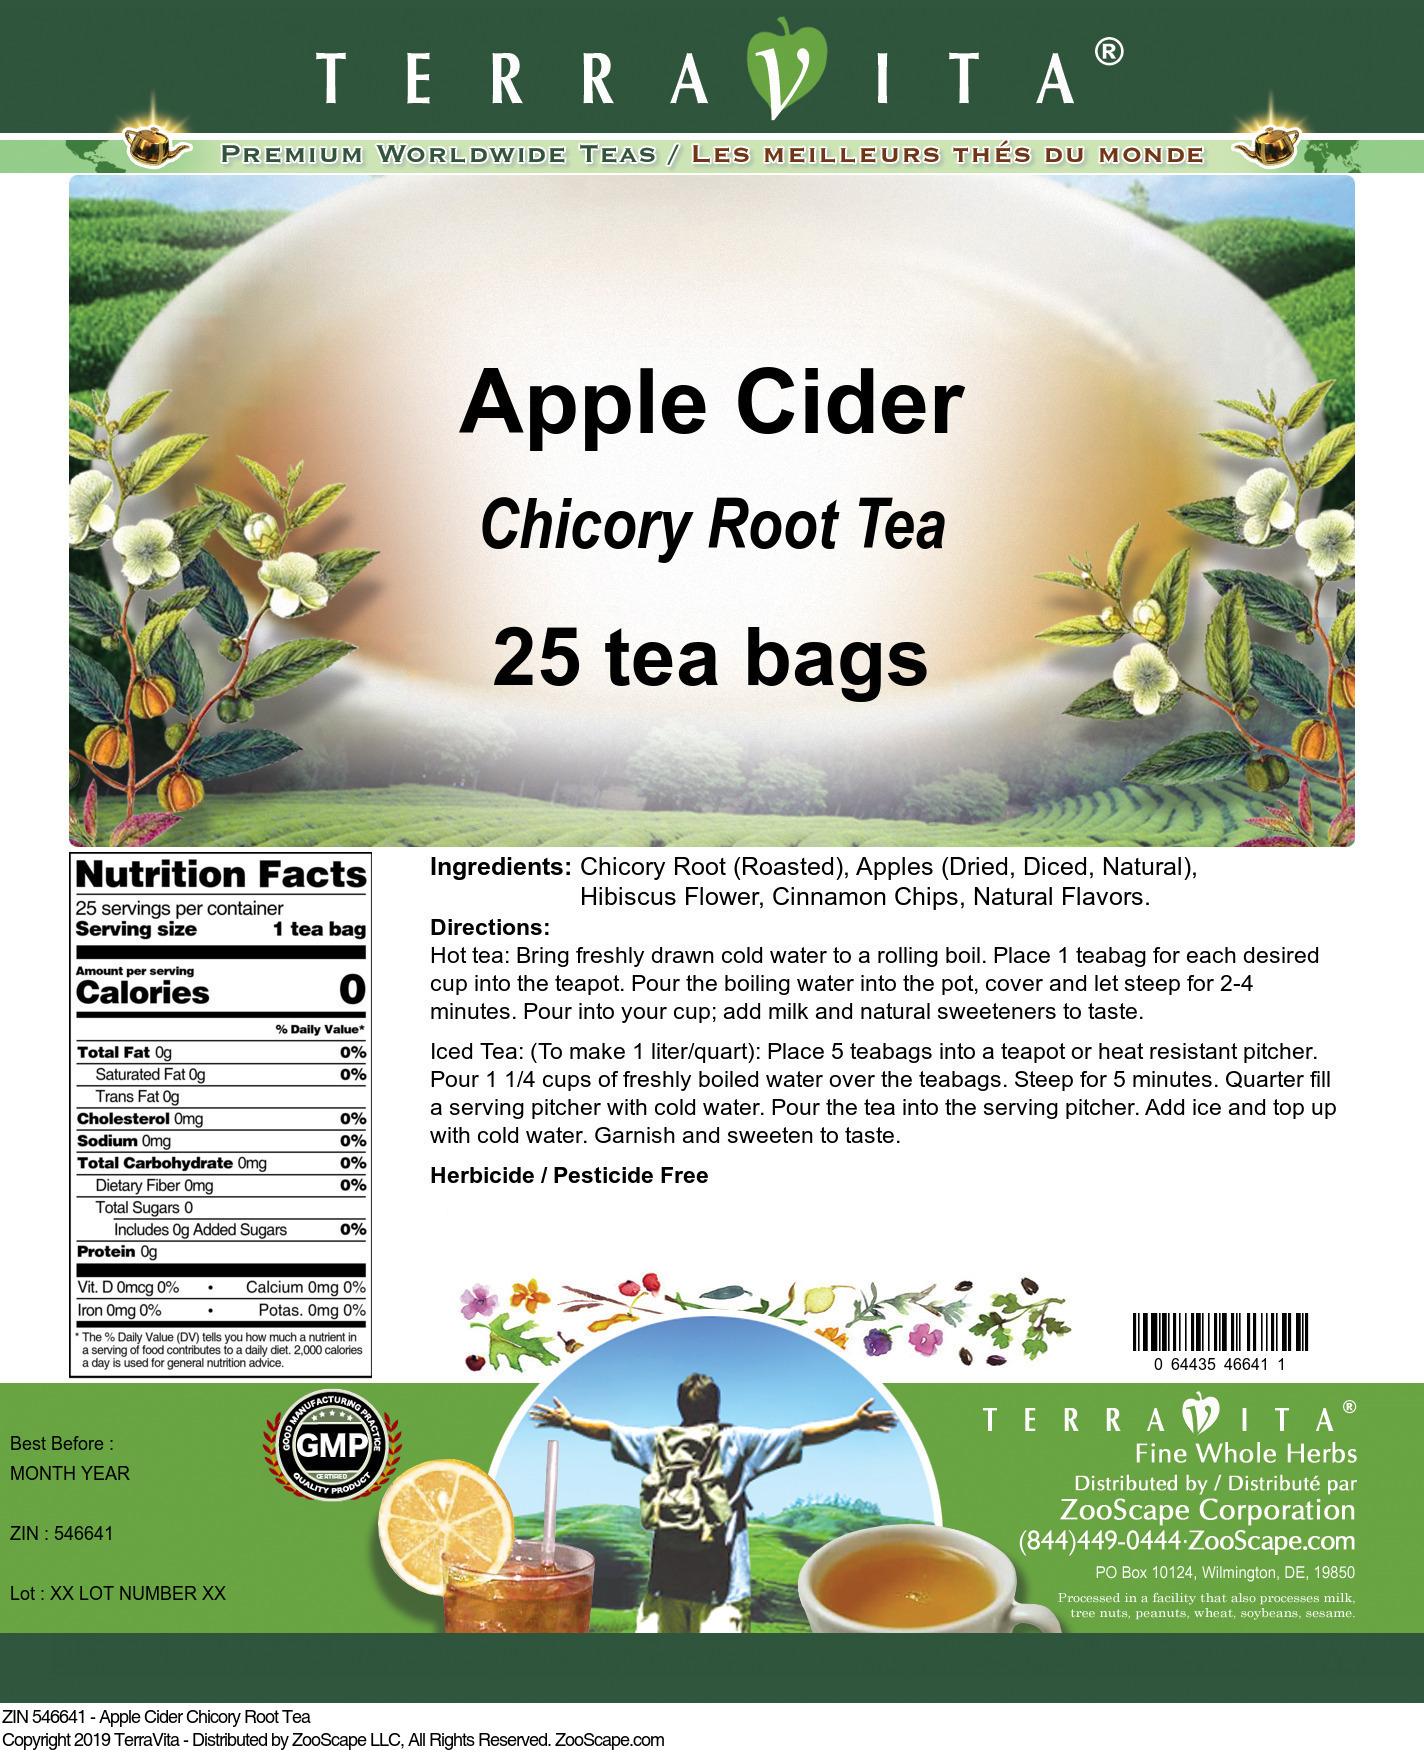 Apple Cider Chicory Root Tea